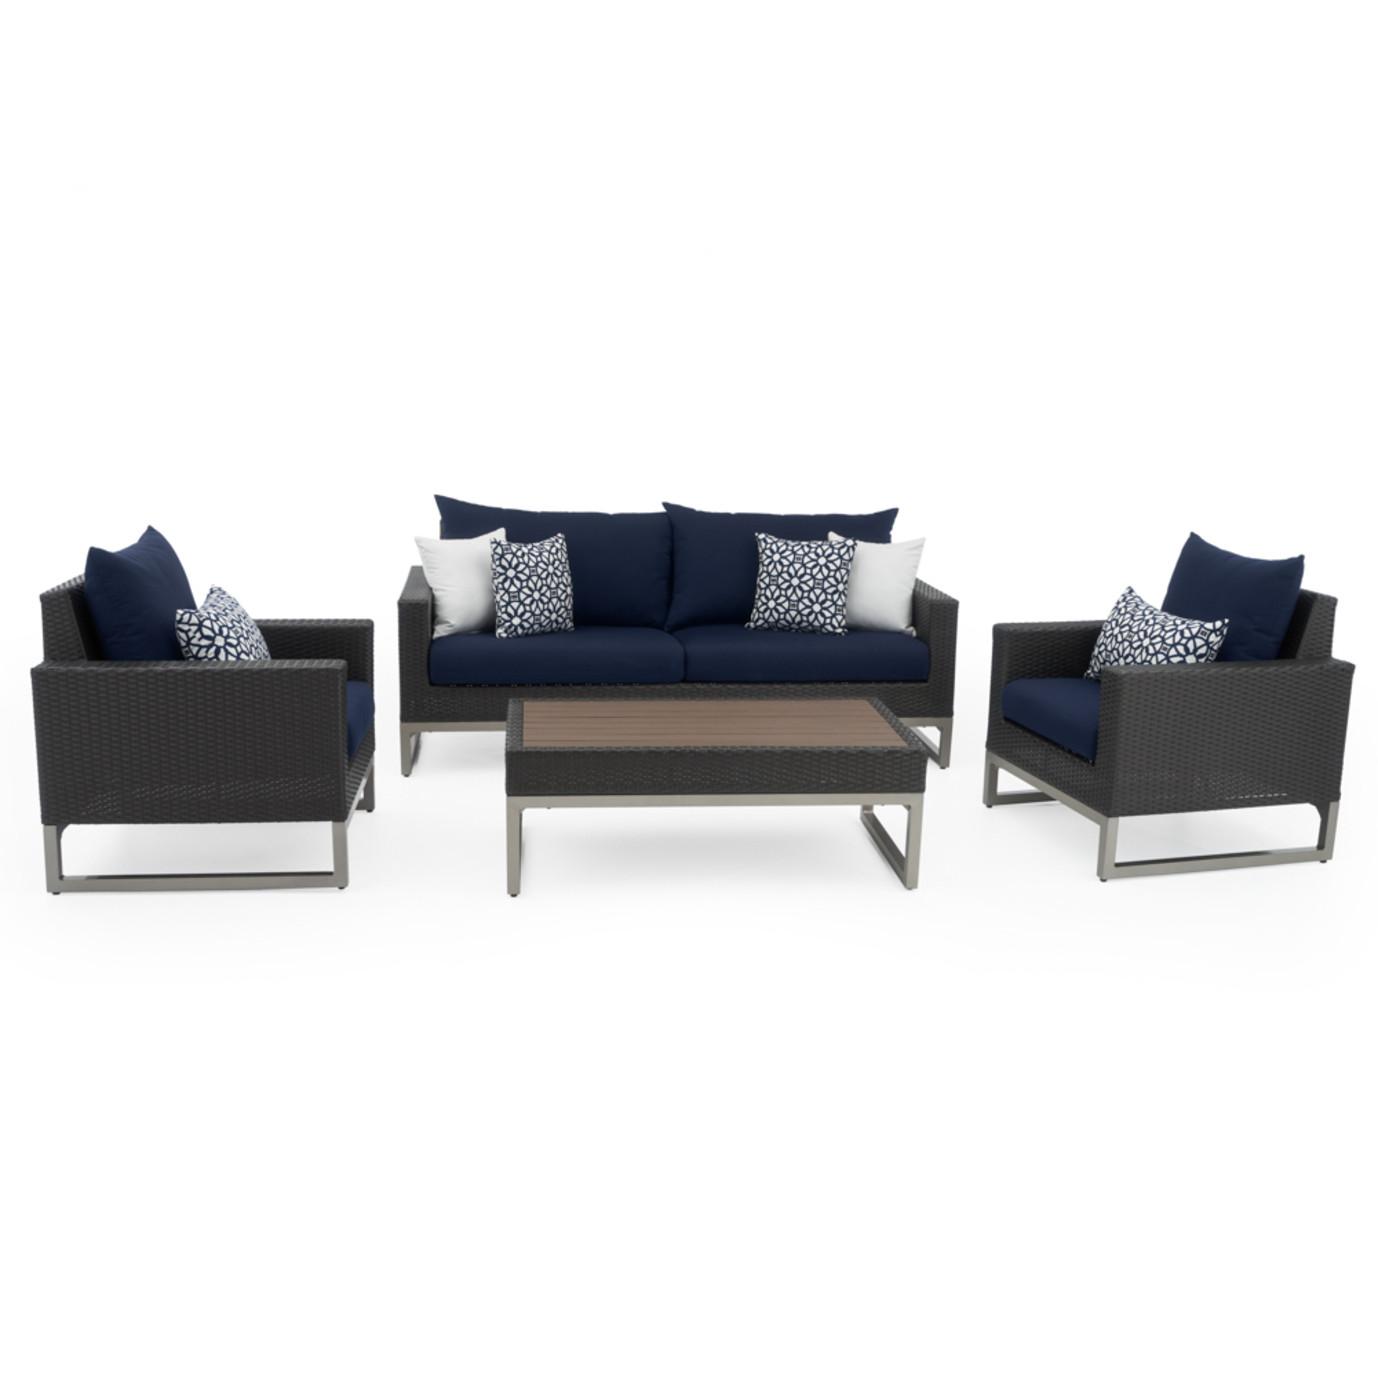 Milo™ Espresso 4 Piece Seating Set - Navy Blue